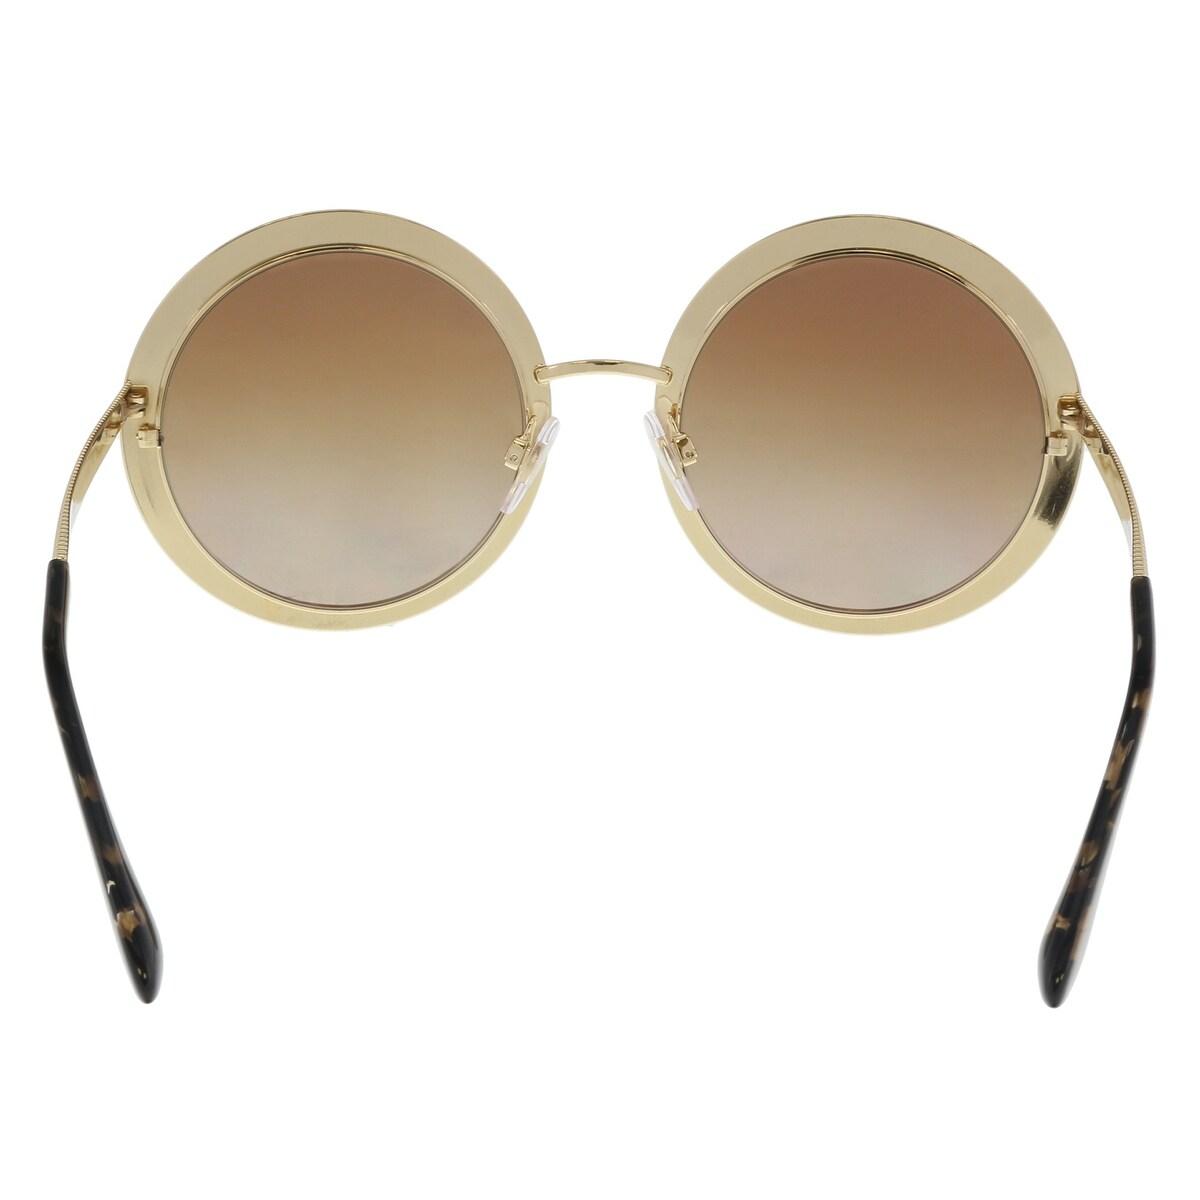 Dolce and Gabbana DG2179 Sonnenbrille Gold 02/13 54mm qIJrhl